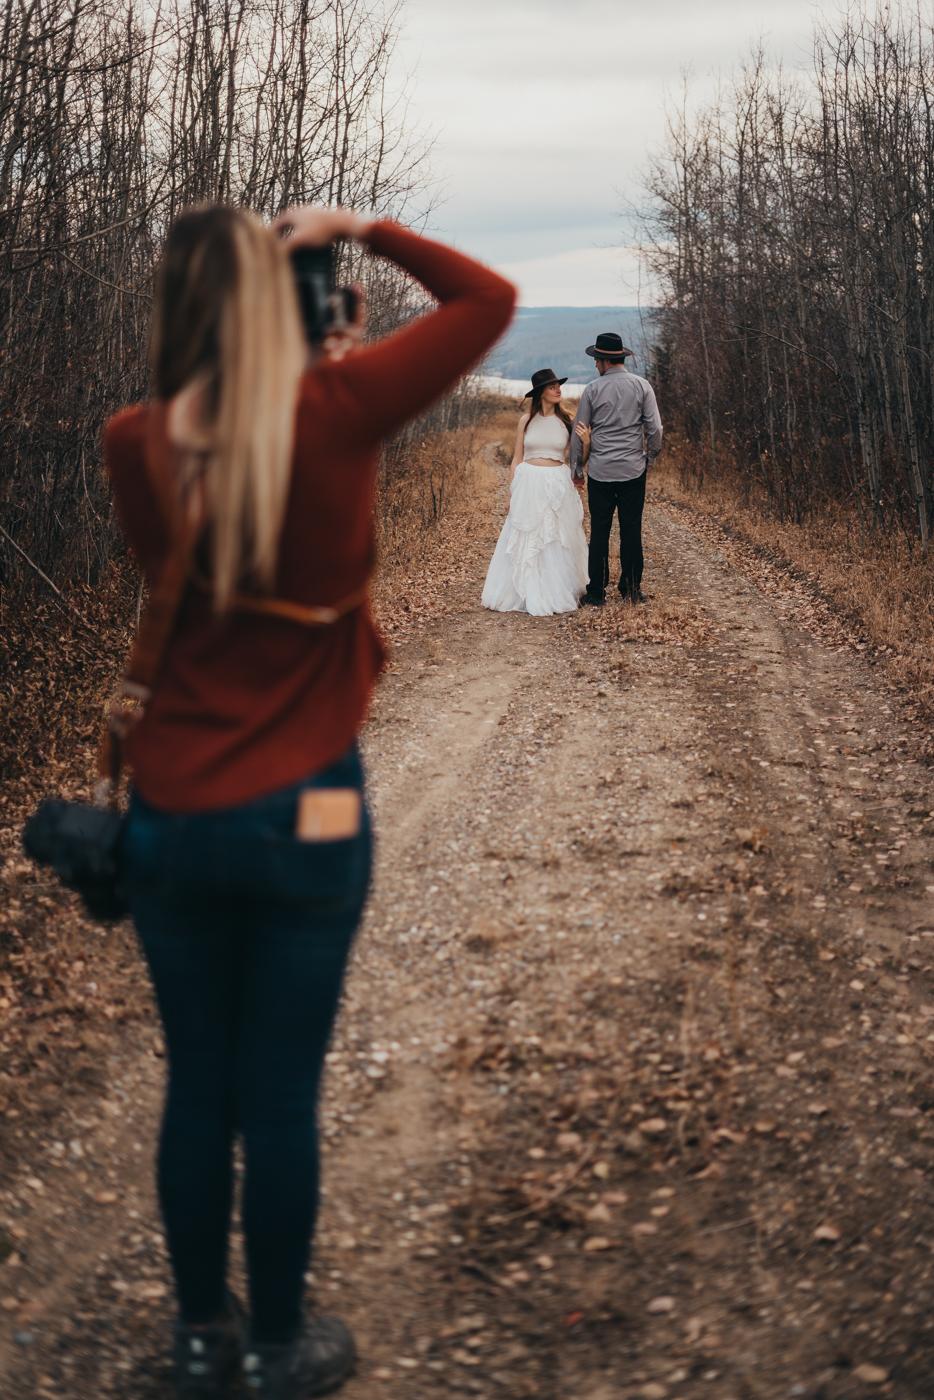 FortSt.John_photographer_TyraEPhotography_Wedding_Couple_Family_Photograhy_DawsonCreek_Elopement_Bride_Boduoir_Portraits-48.jpg